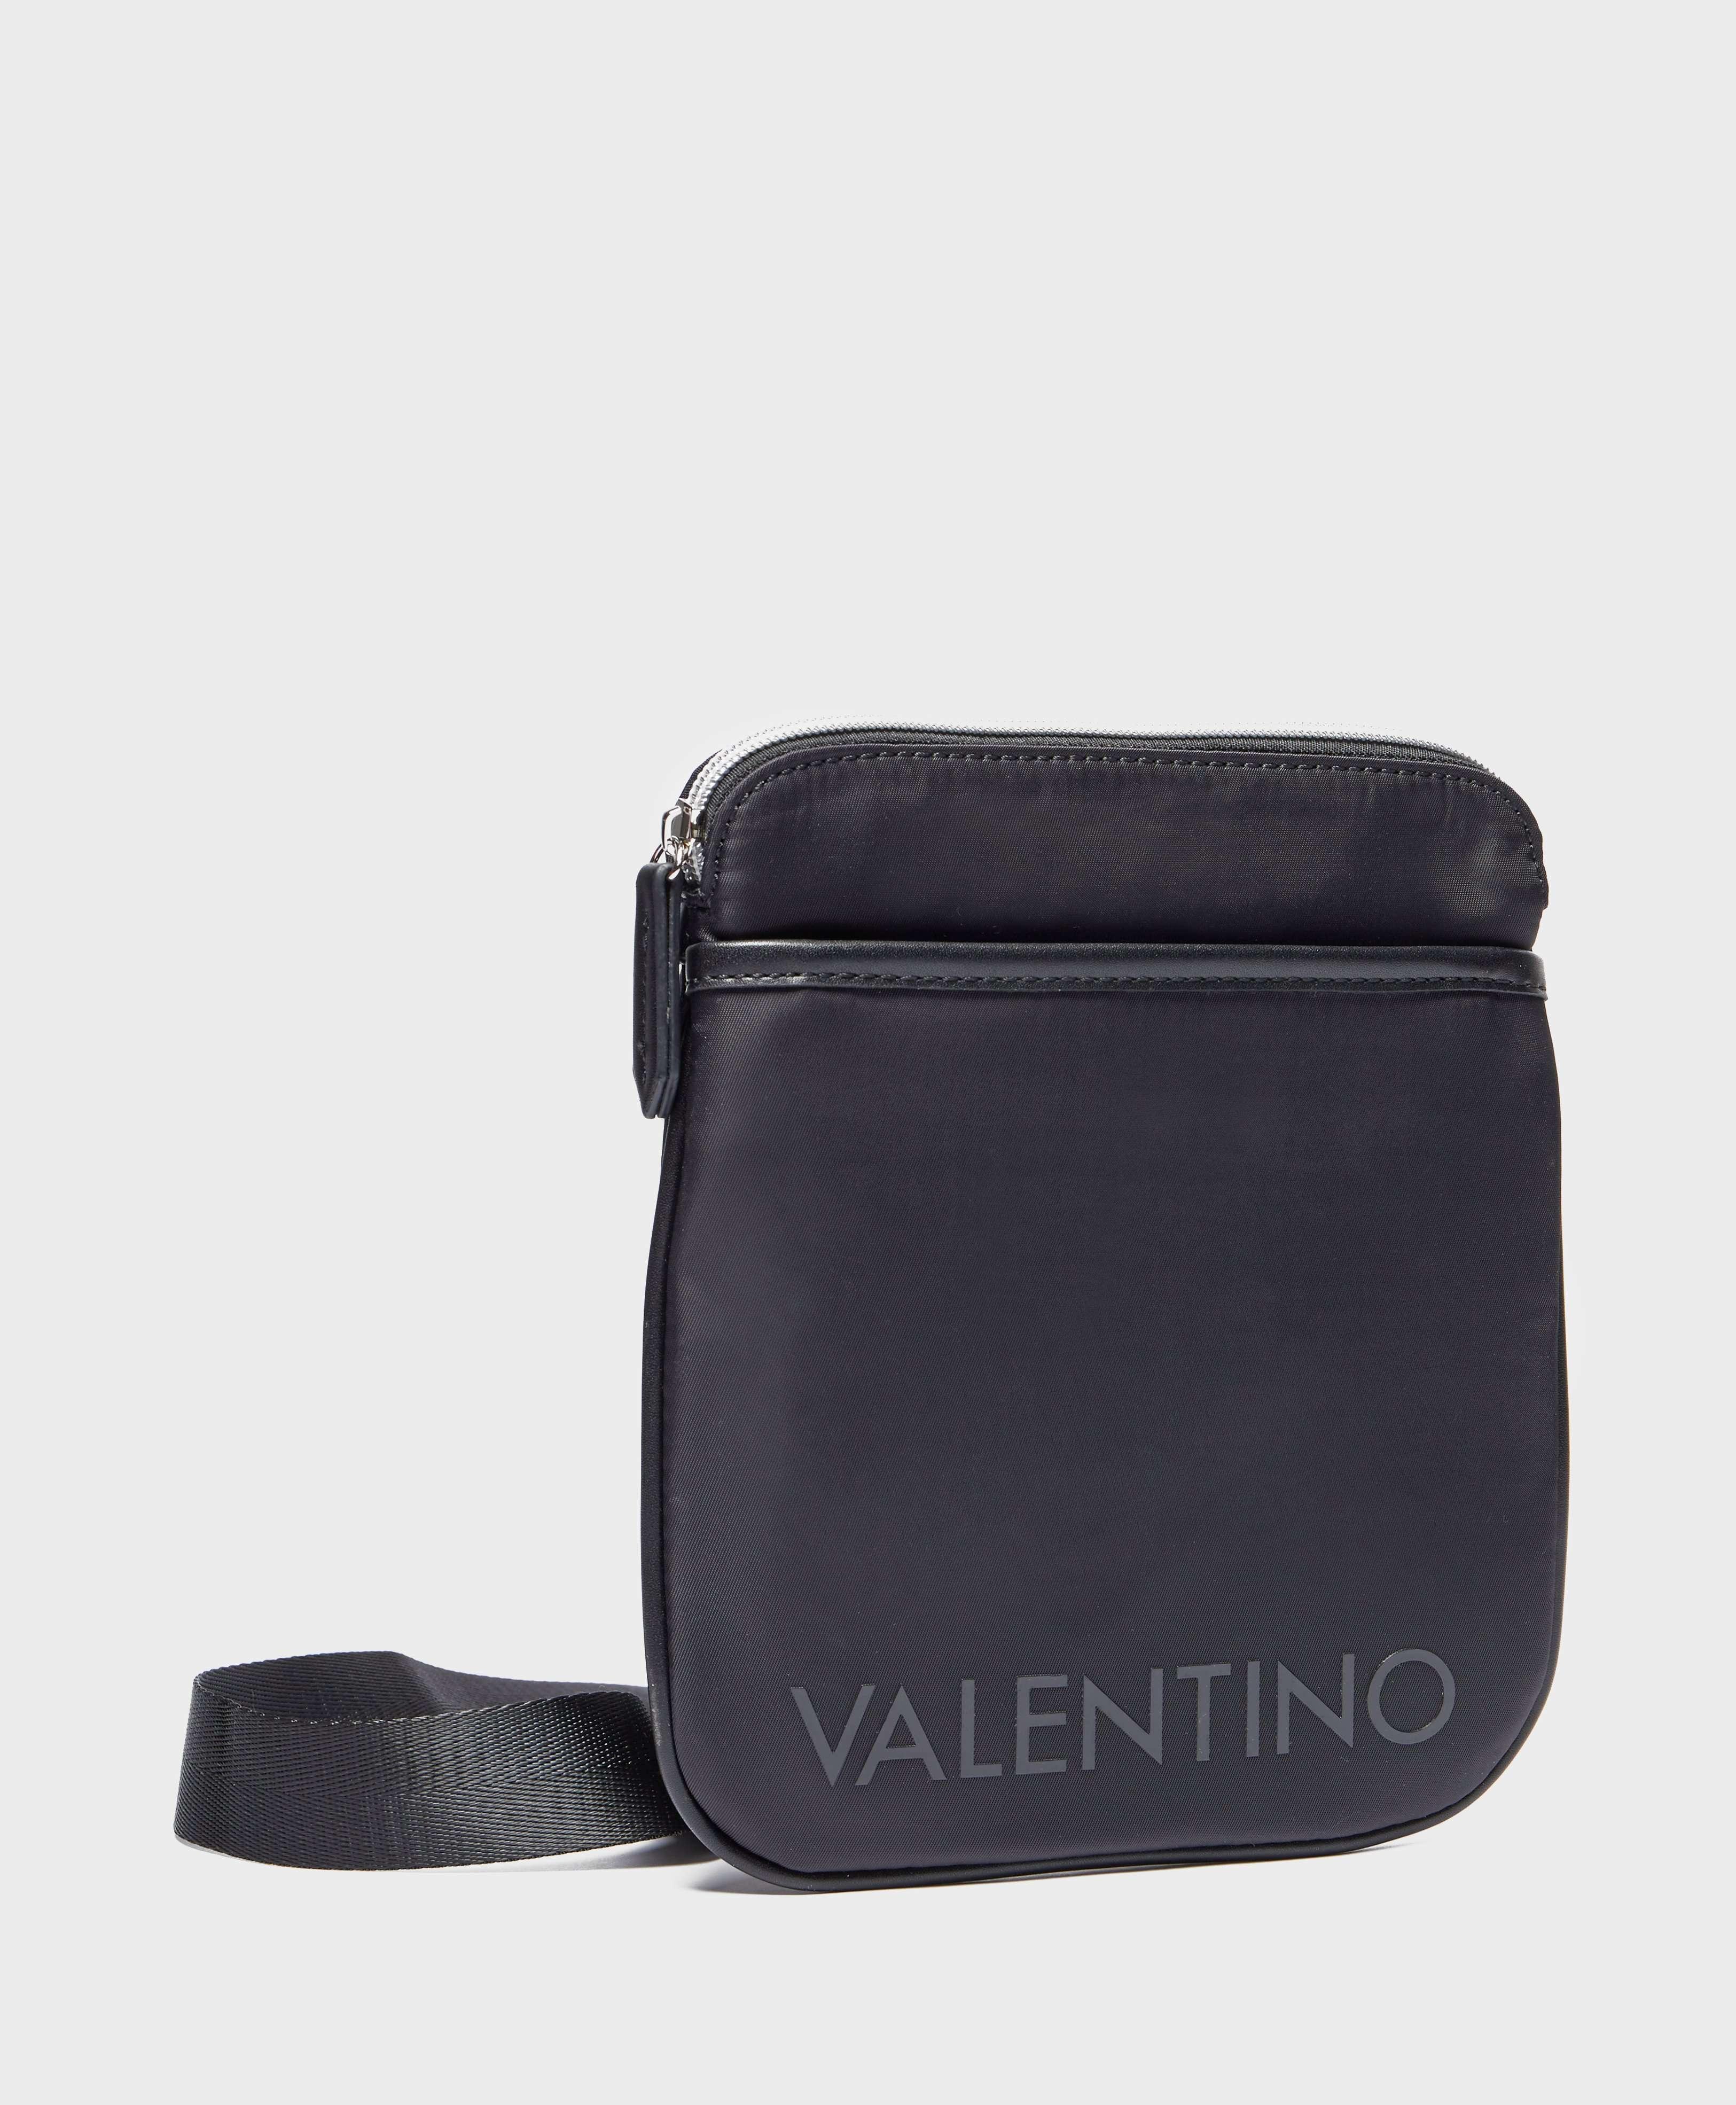 Valentino by Mario Valentino Nylon Small Bag